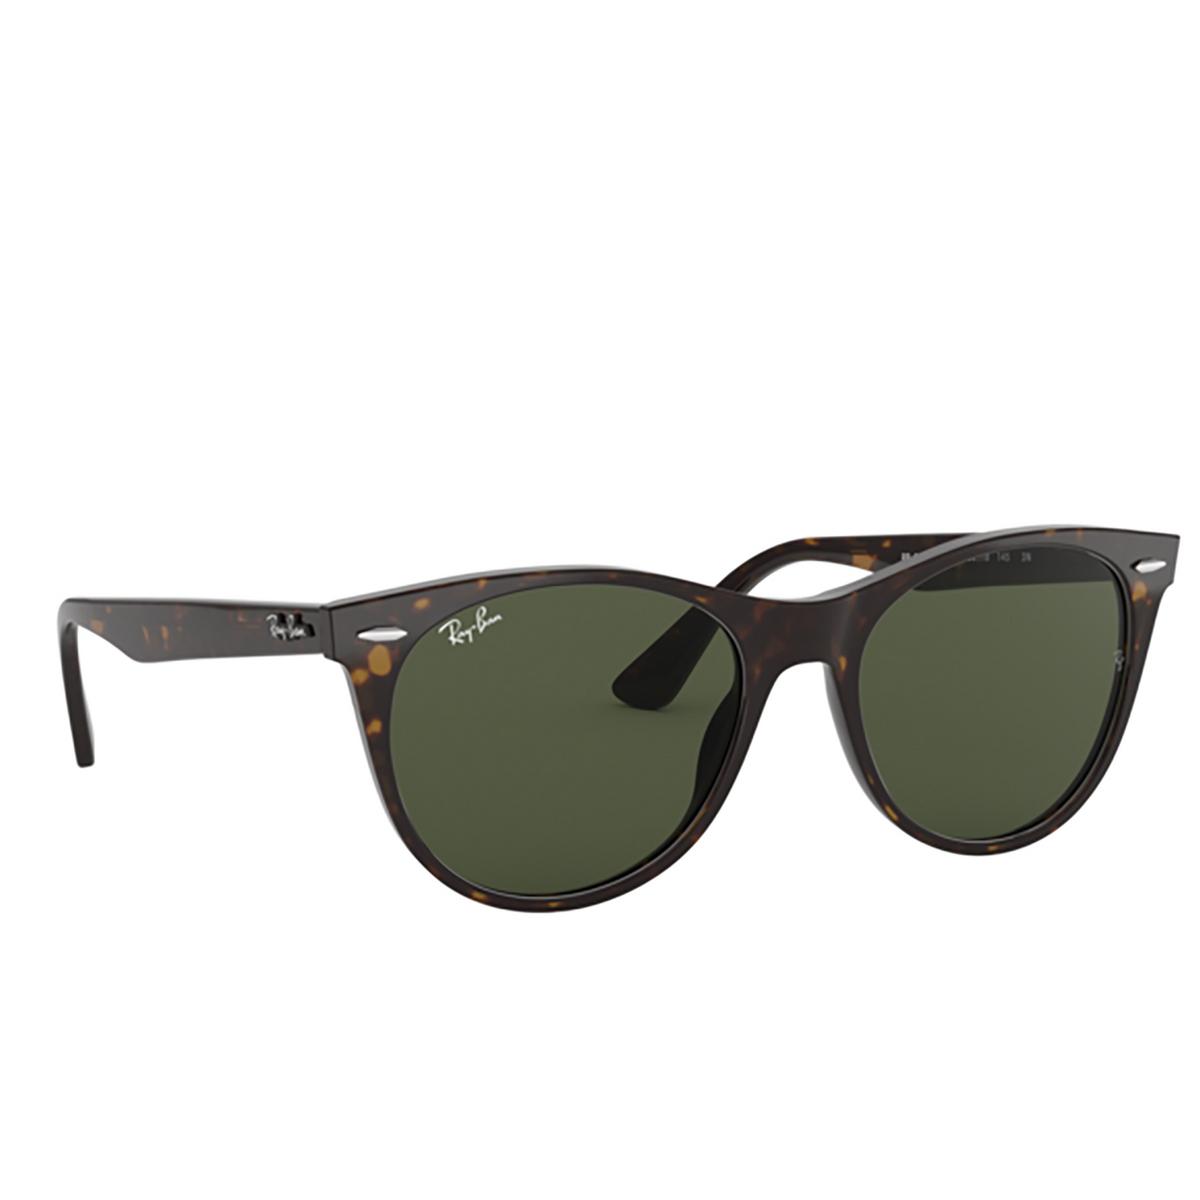 Ray-Ban® Square Sunglasses: Wayfarer Ii RB2185 color Tortoise 902/31 - three-quarters view.